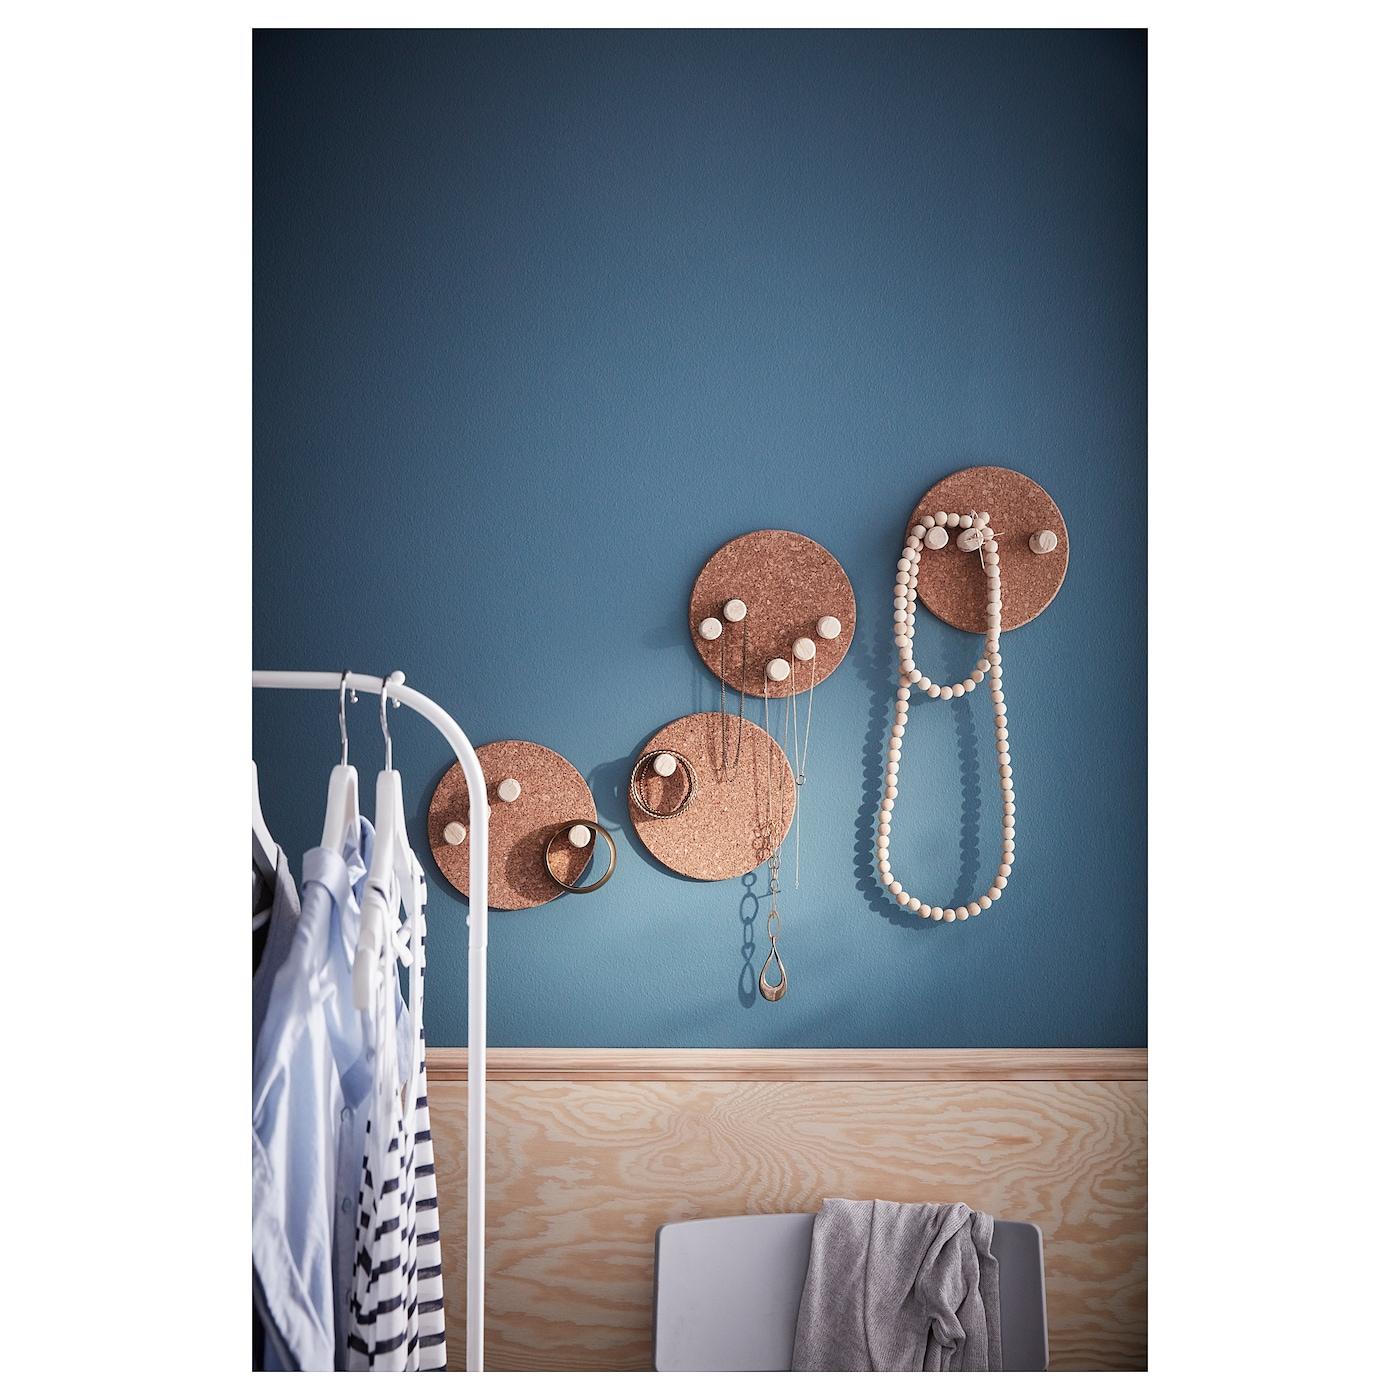 IKEA PACK OF 3 ROUND CORK HEAT RESISTANT POT//PAN STAND Diameter:19cm